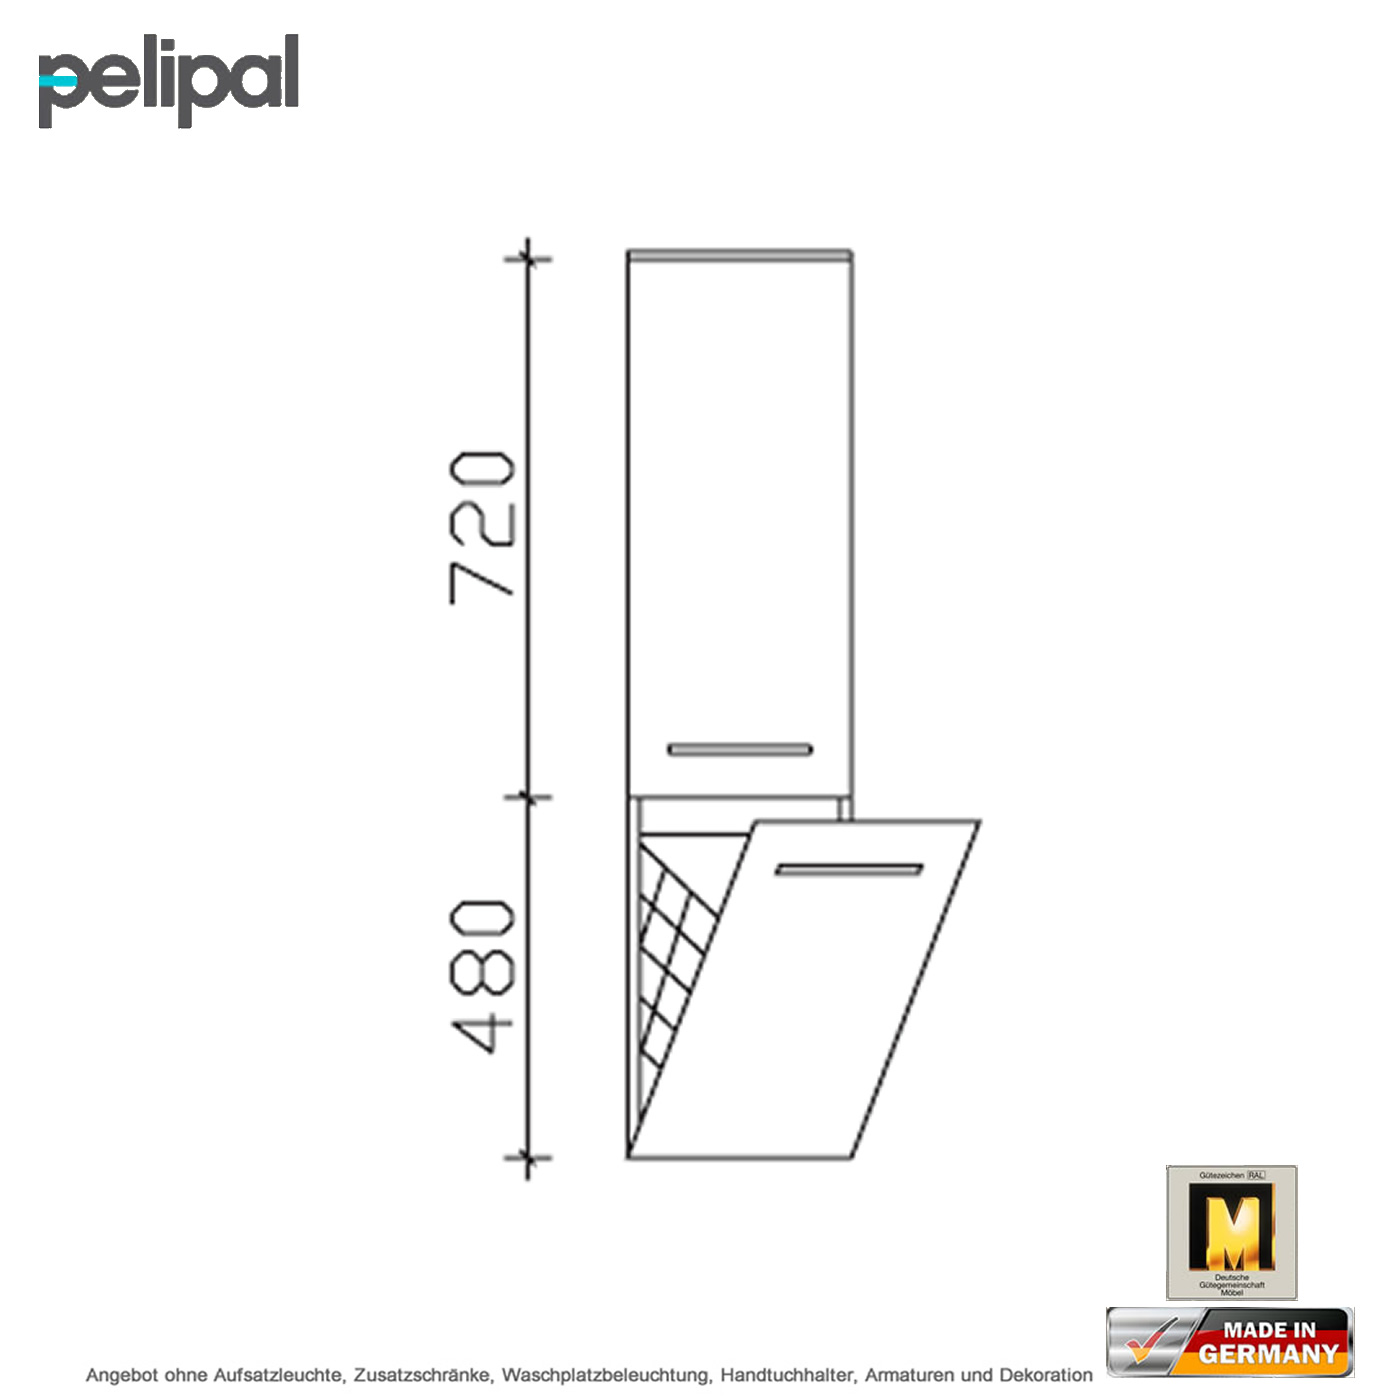 pelipal solitaire 7025 midischrank mit w schekippe 30 cm impulsbad. Black Bedroom Furniture Sets. Home Design Ideas